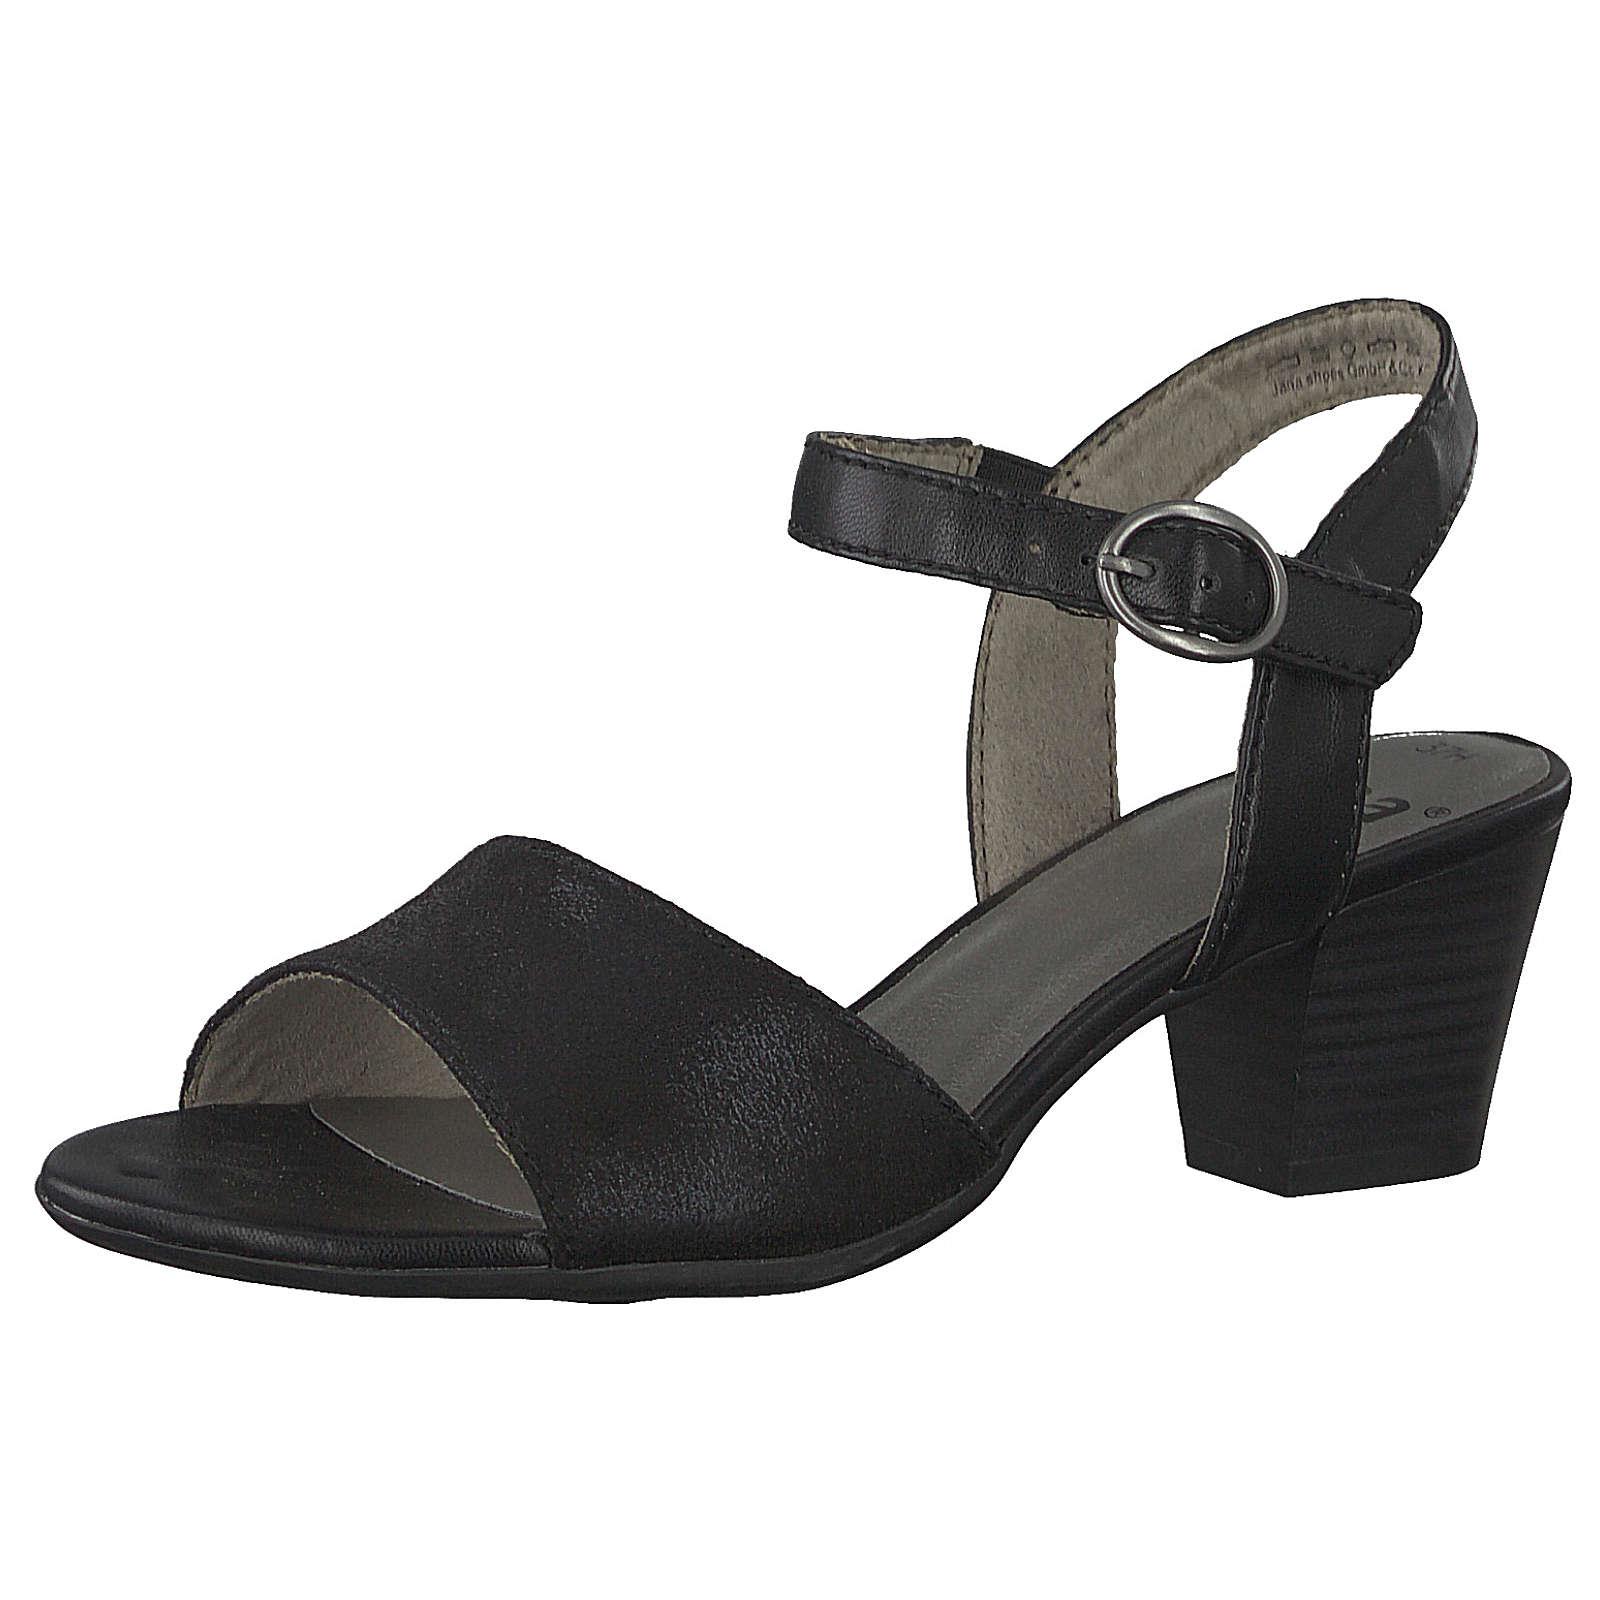 Jana Klassische Sandaletten schwarz Damen Gr. 40